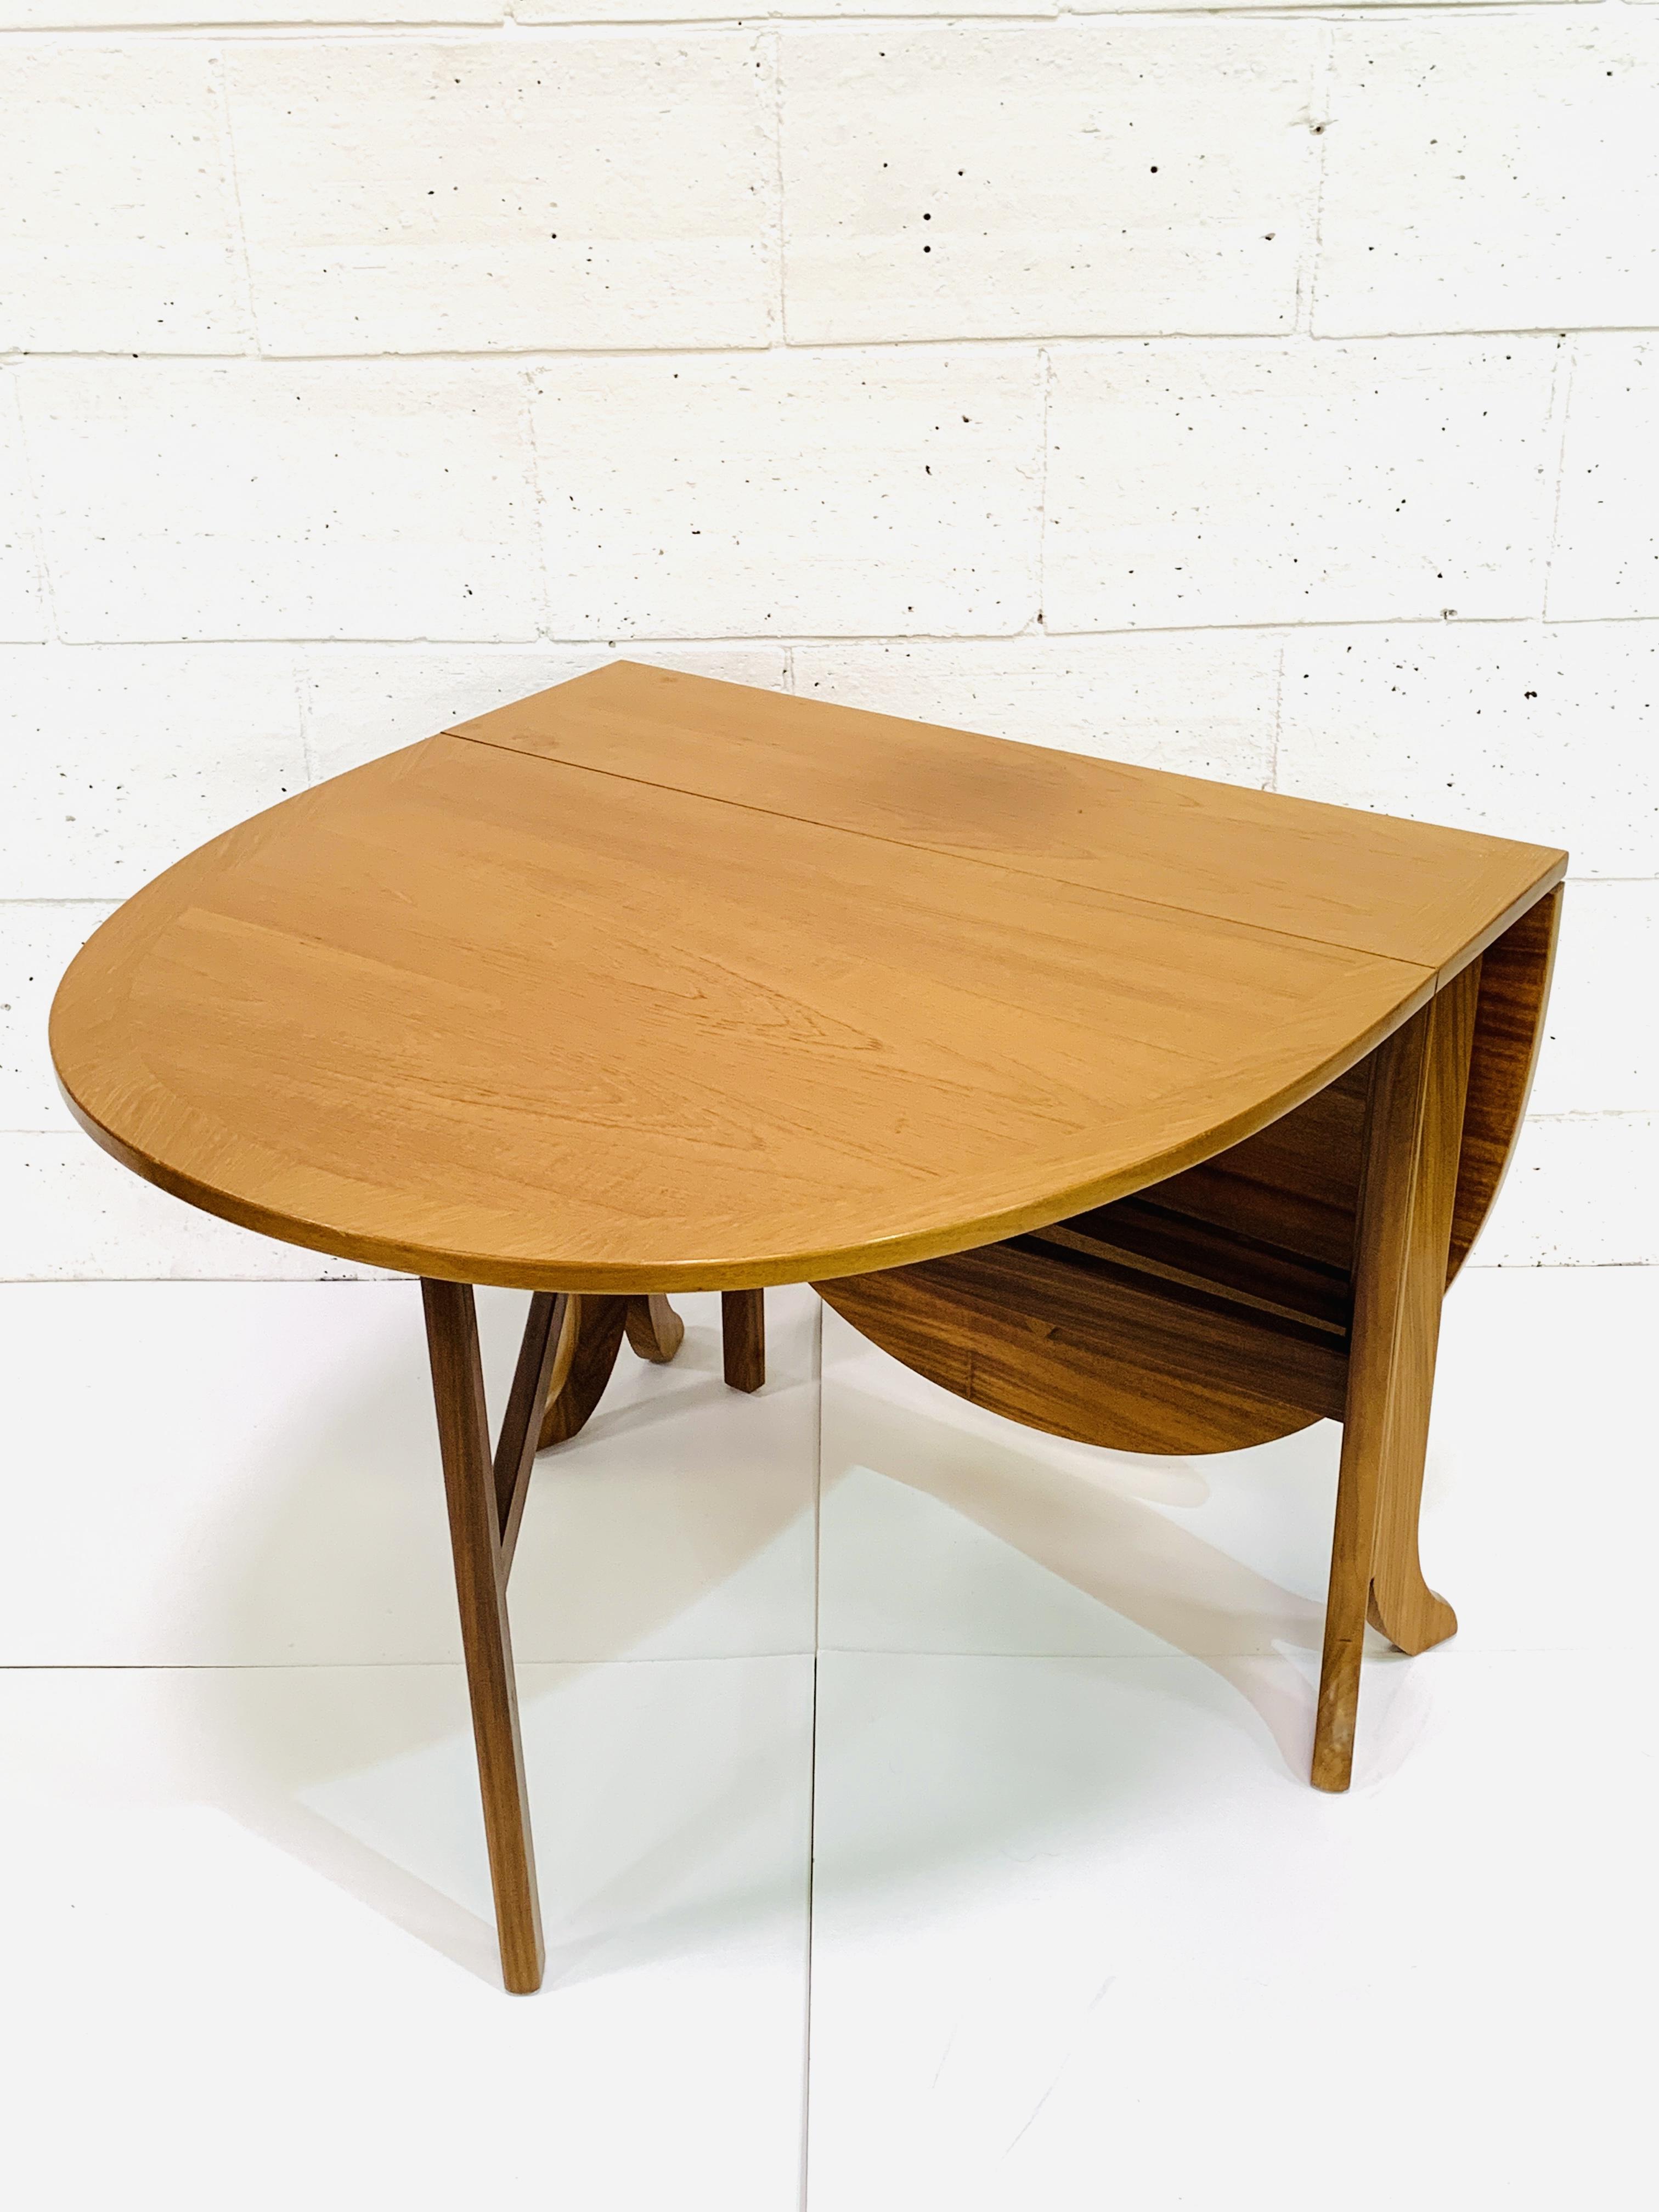 Contemporary hardwood gateleg drop side table - Image 2 of 4